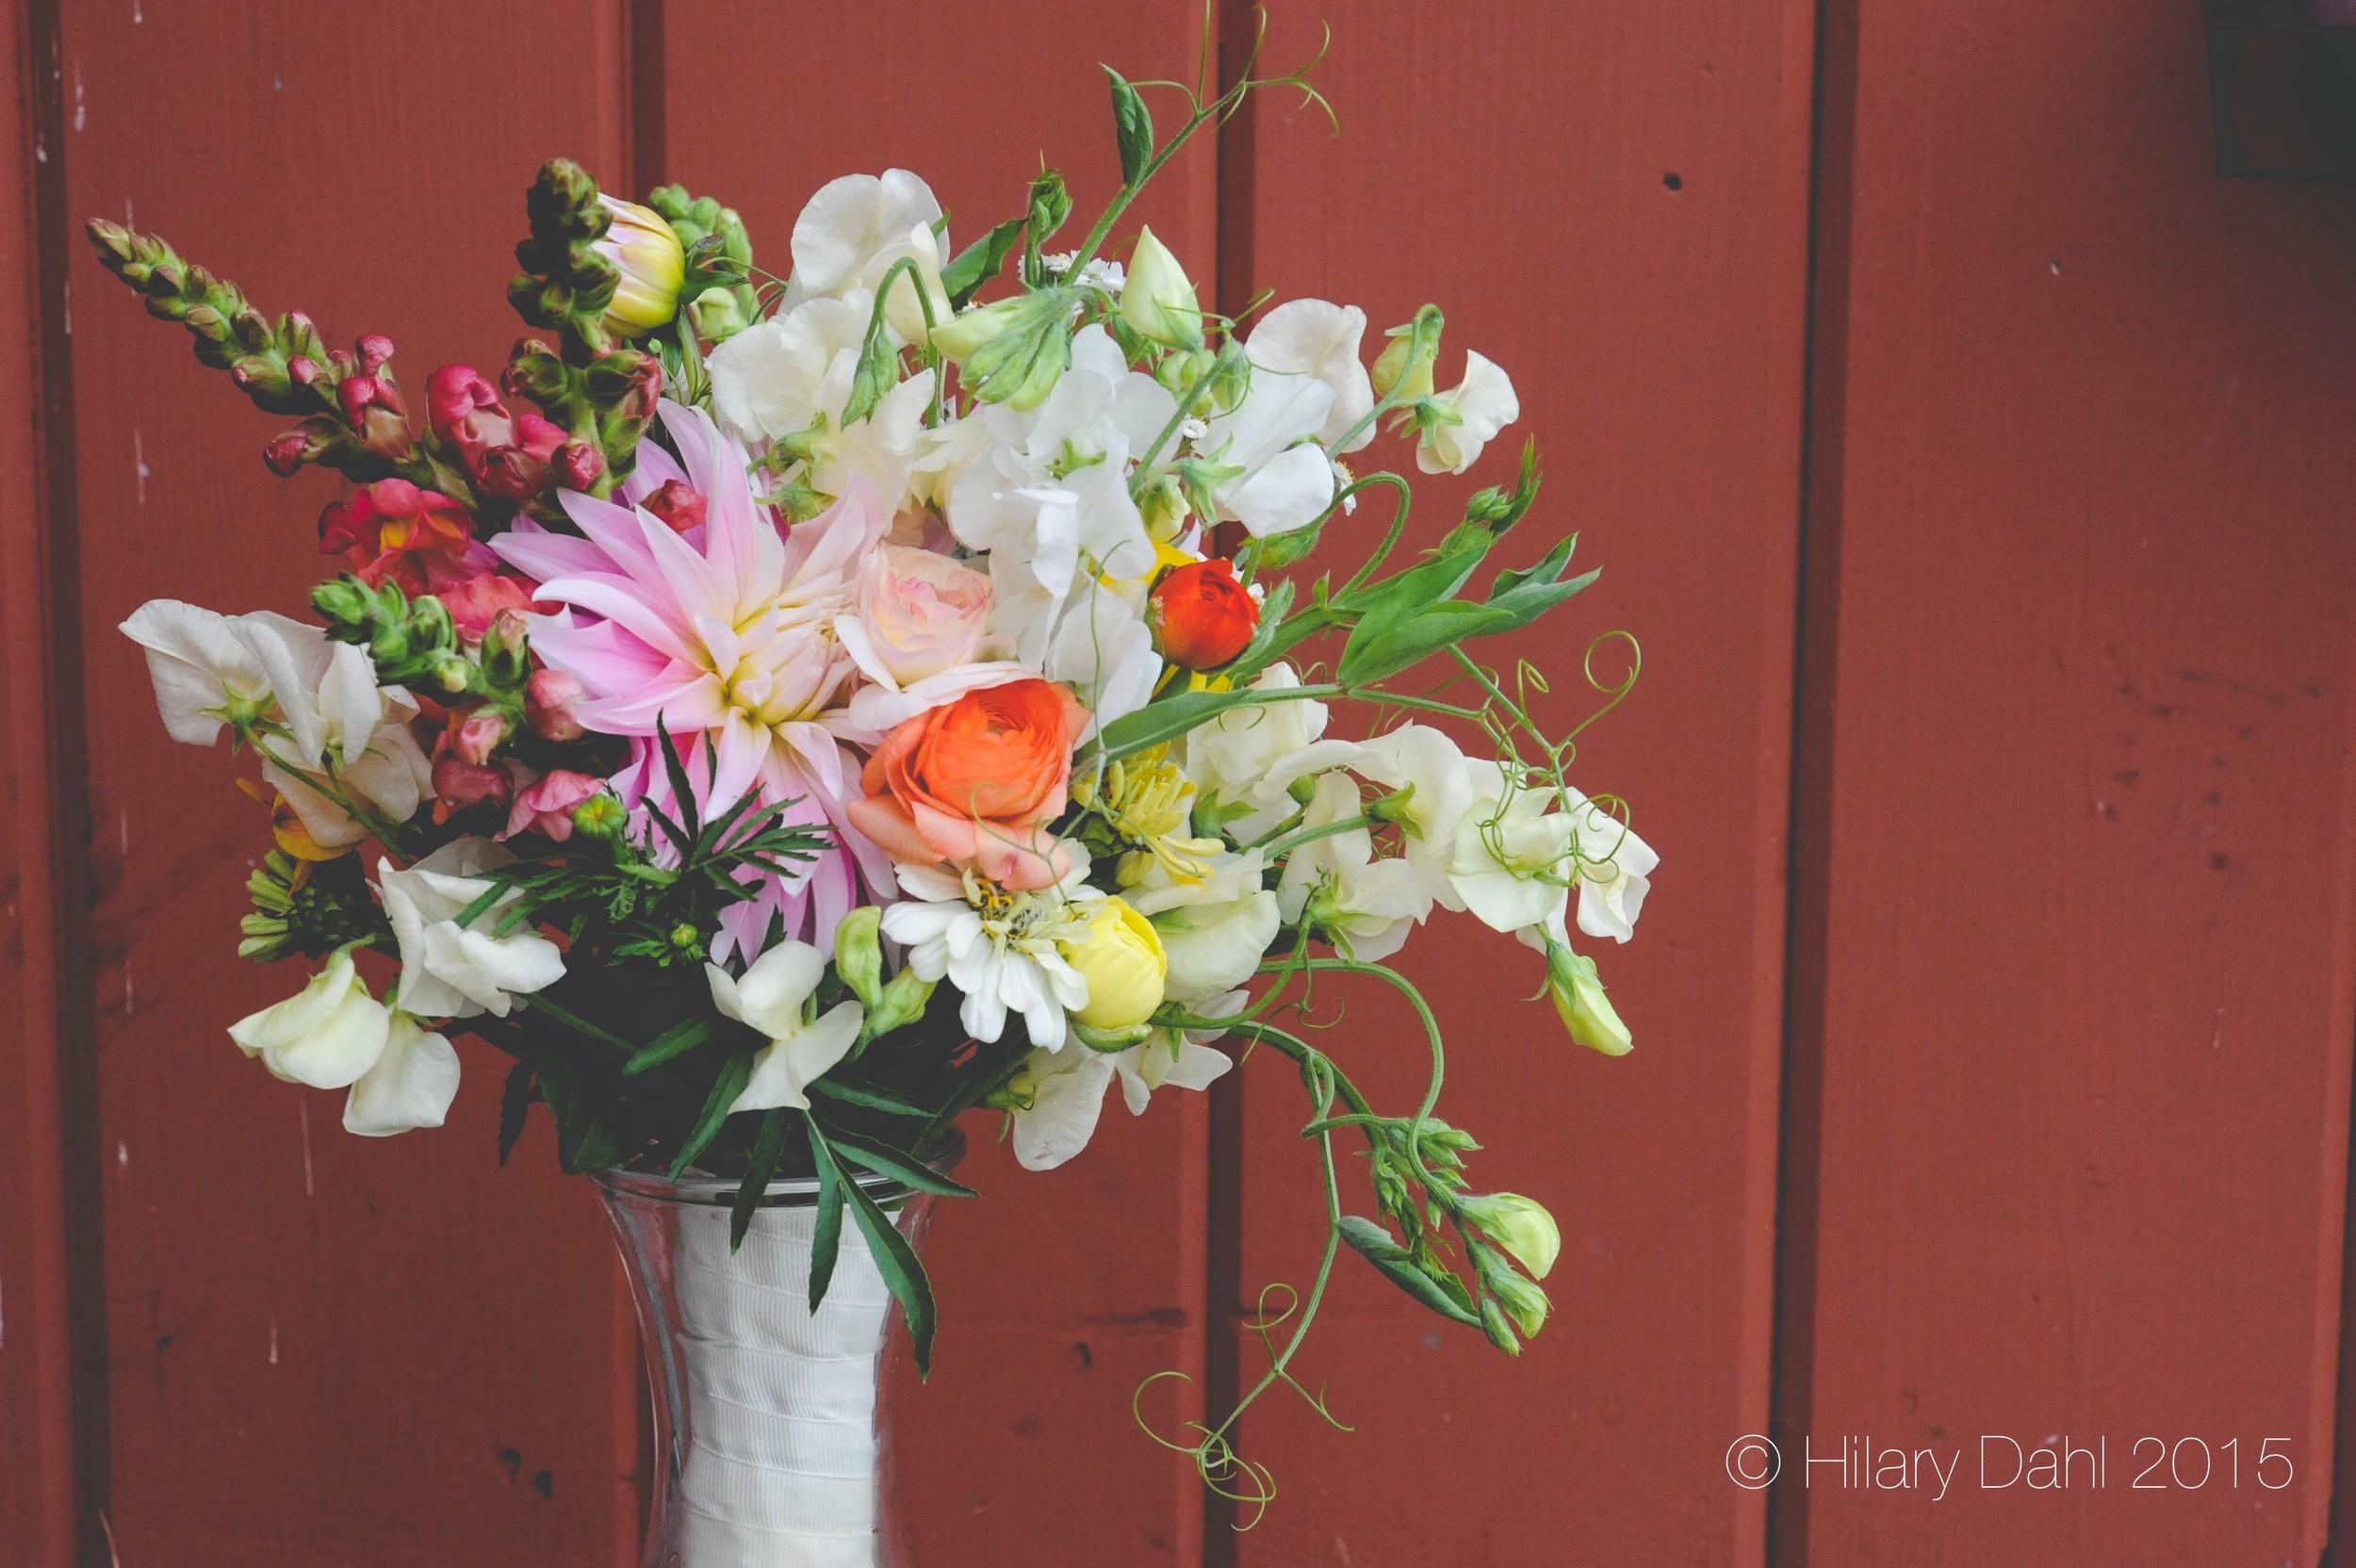 Bouquet including: sweet peas, marigold buds, marigold foliage, snapdragons & zinnias